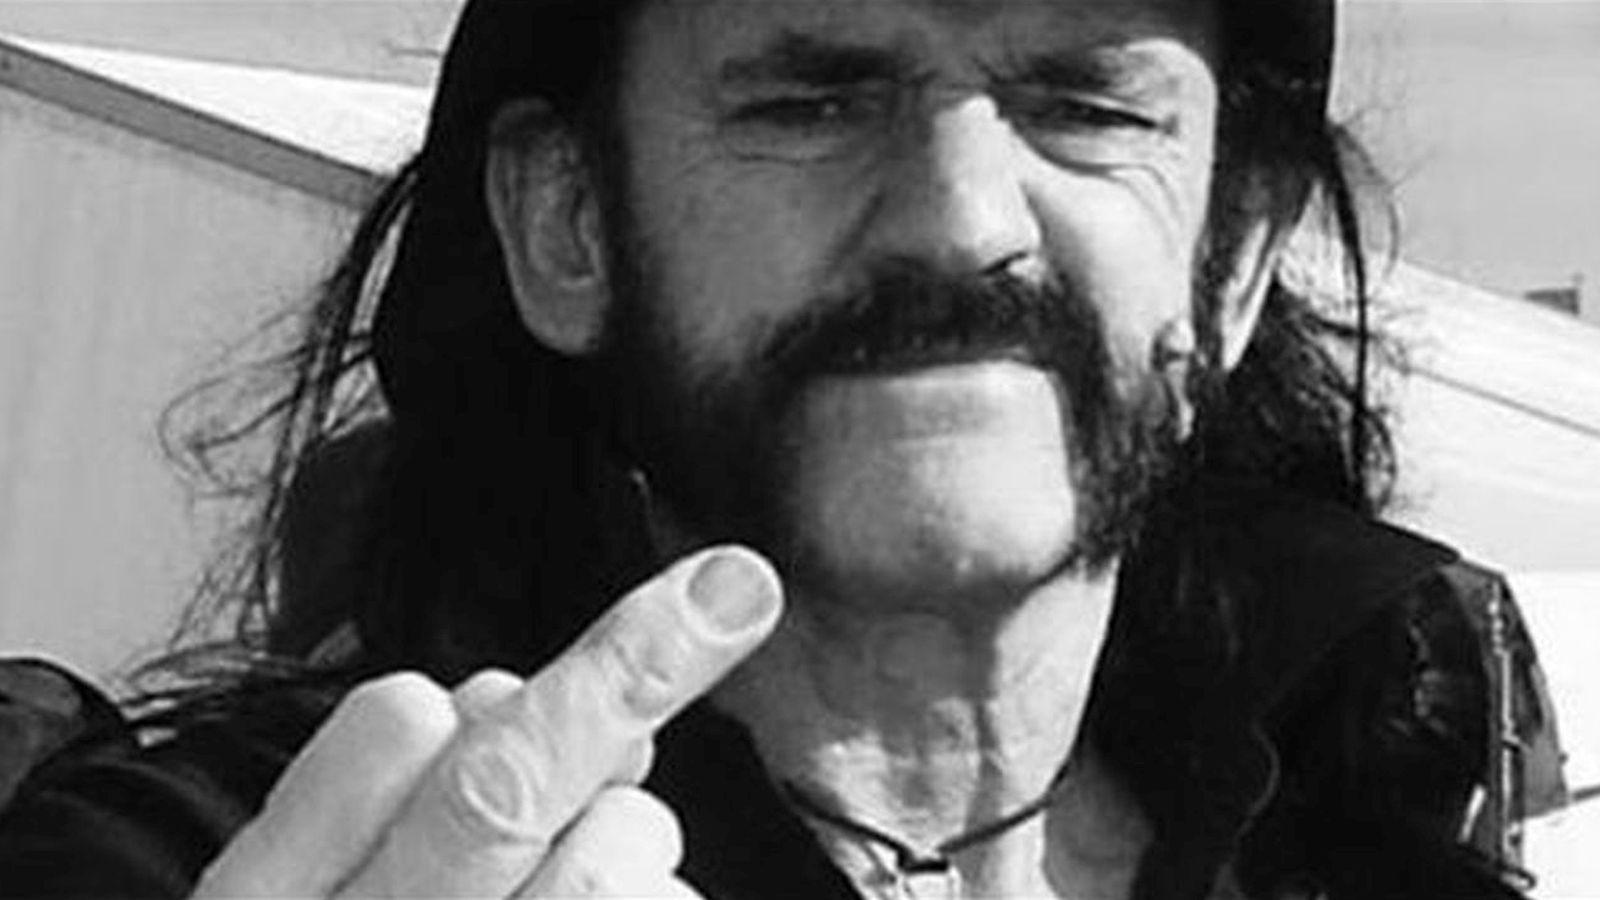 Lemmy%2BKilmister%2B-%2BIn%2BMemoriam%2B-%2B24.12.1945-28.12.2015%2B01.jpg